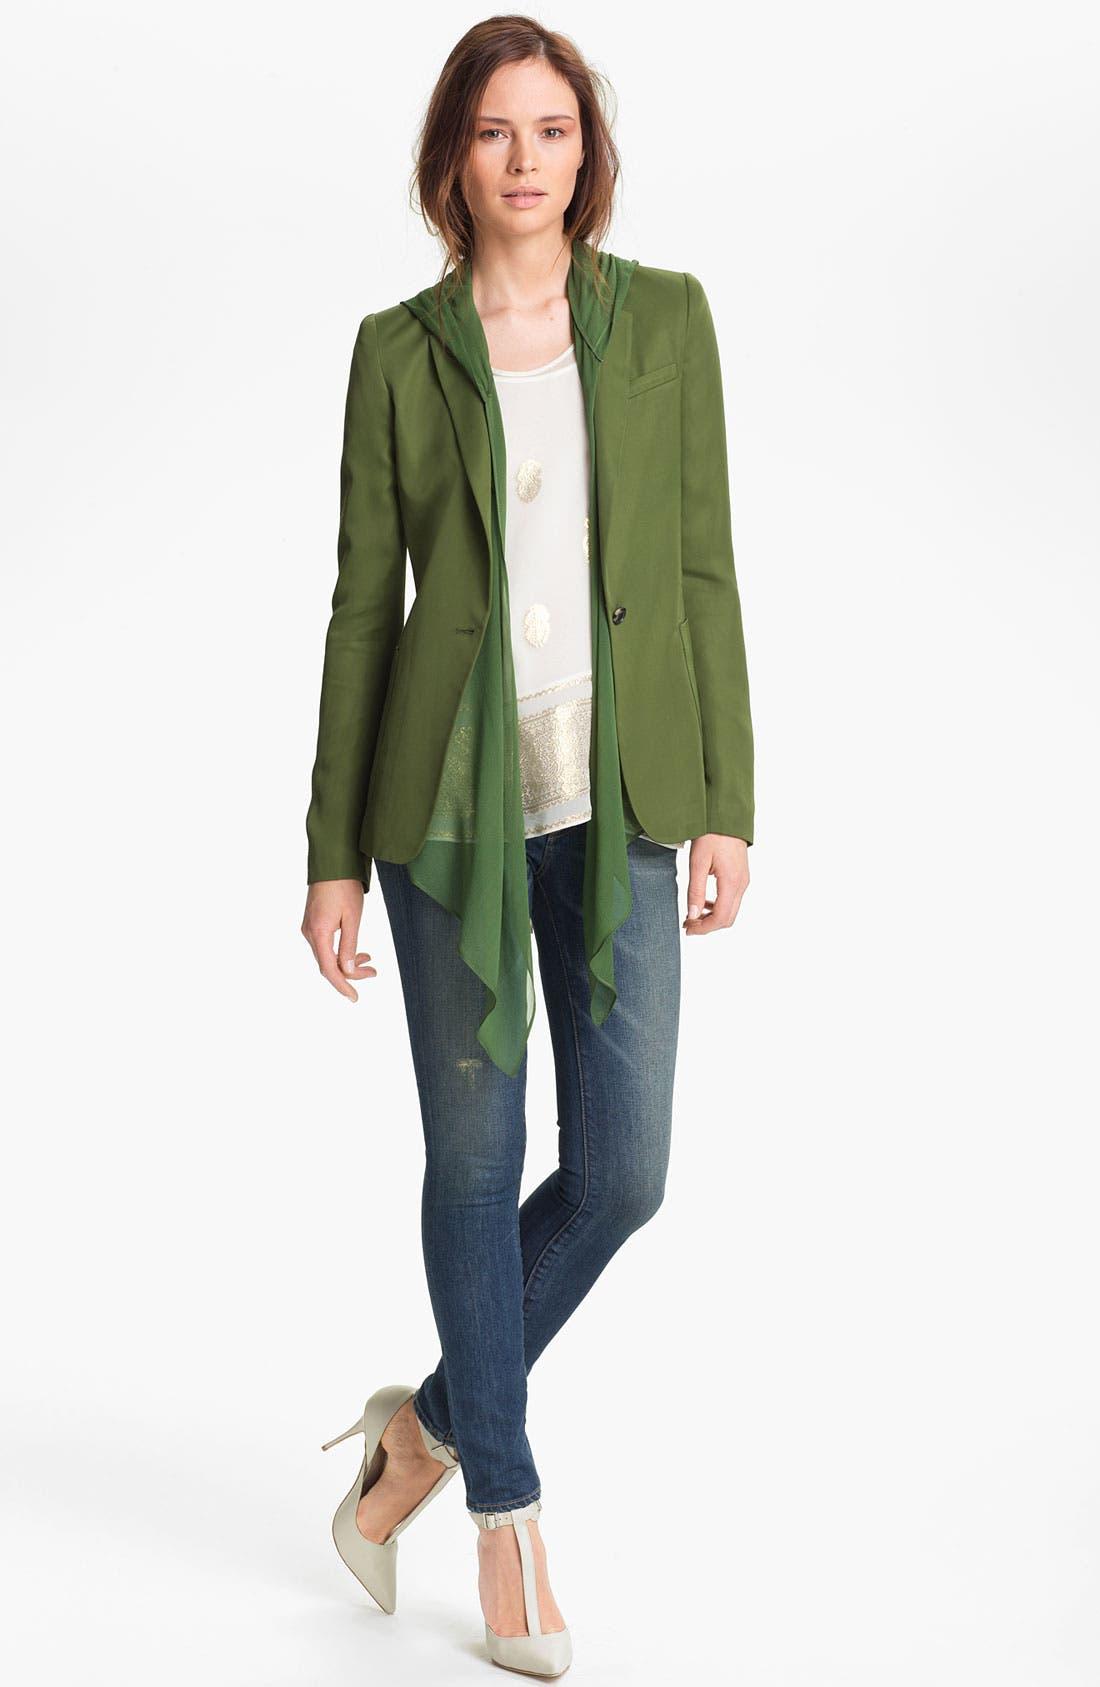 Main Image - Elizabeth and James 'Mona' Hooded Crepe Vest & Satin Jacket